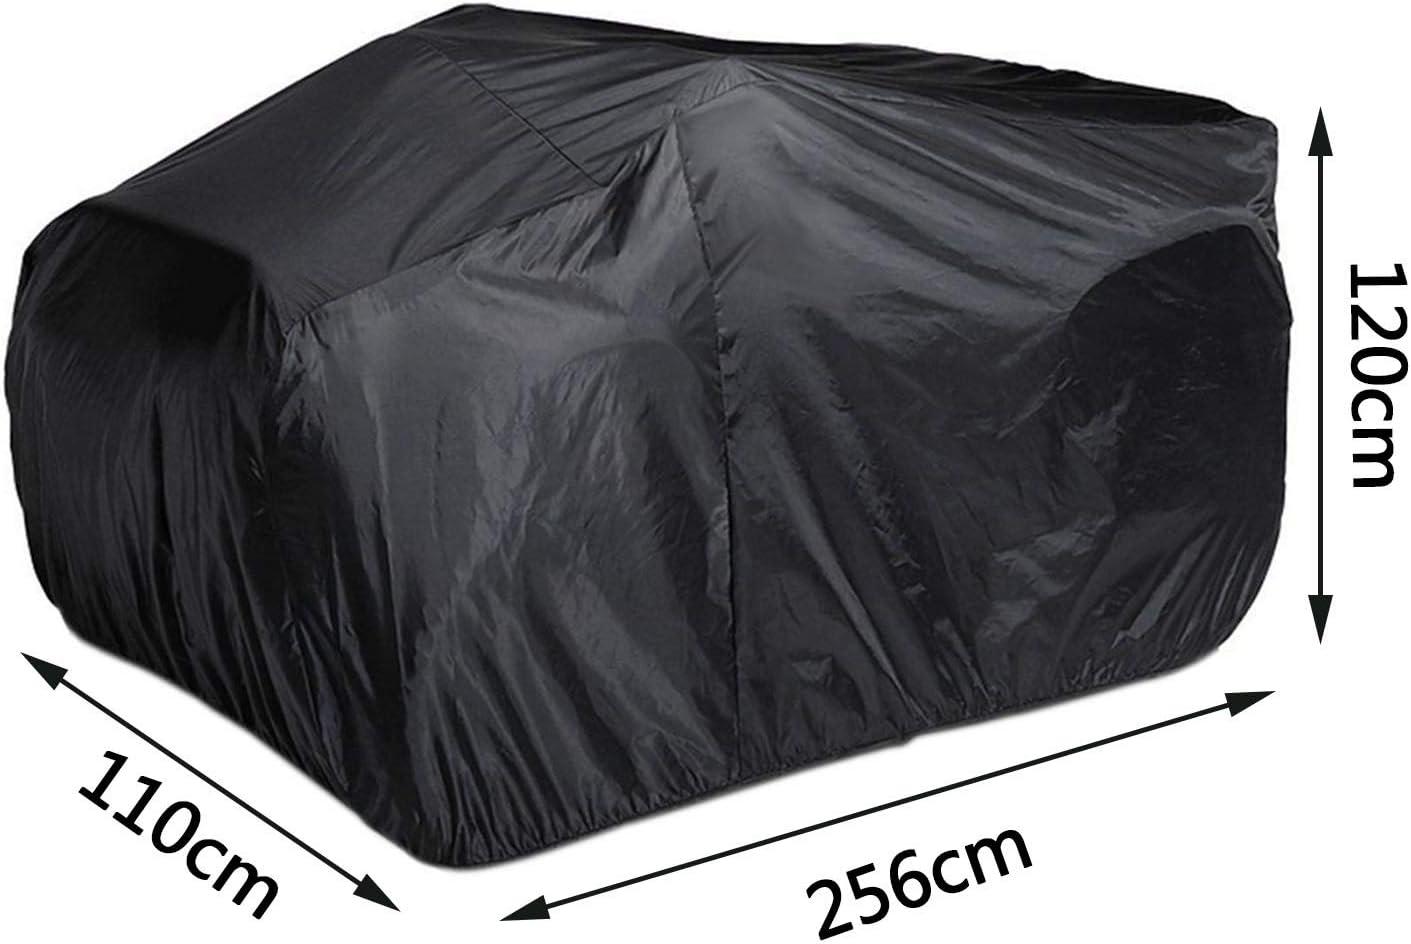 Dustproof Beach Quad Bike ATV Cover Case with Storage Bag Durable Outdoor Portable for 250-1000CC Black 256x120x110cm